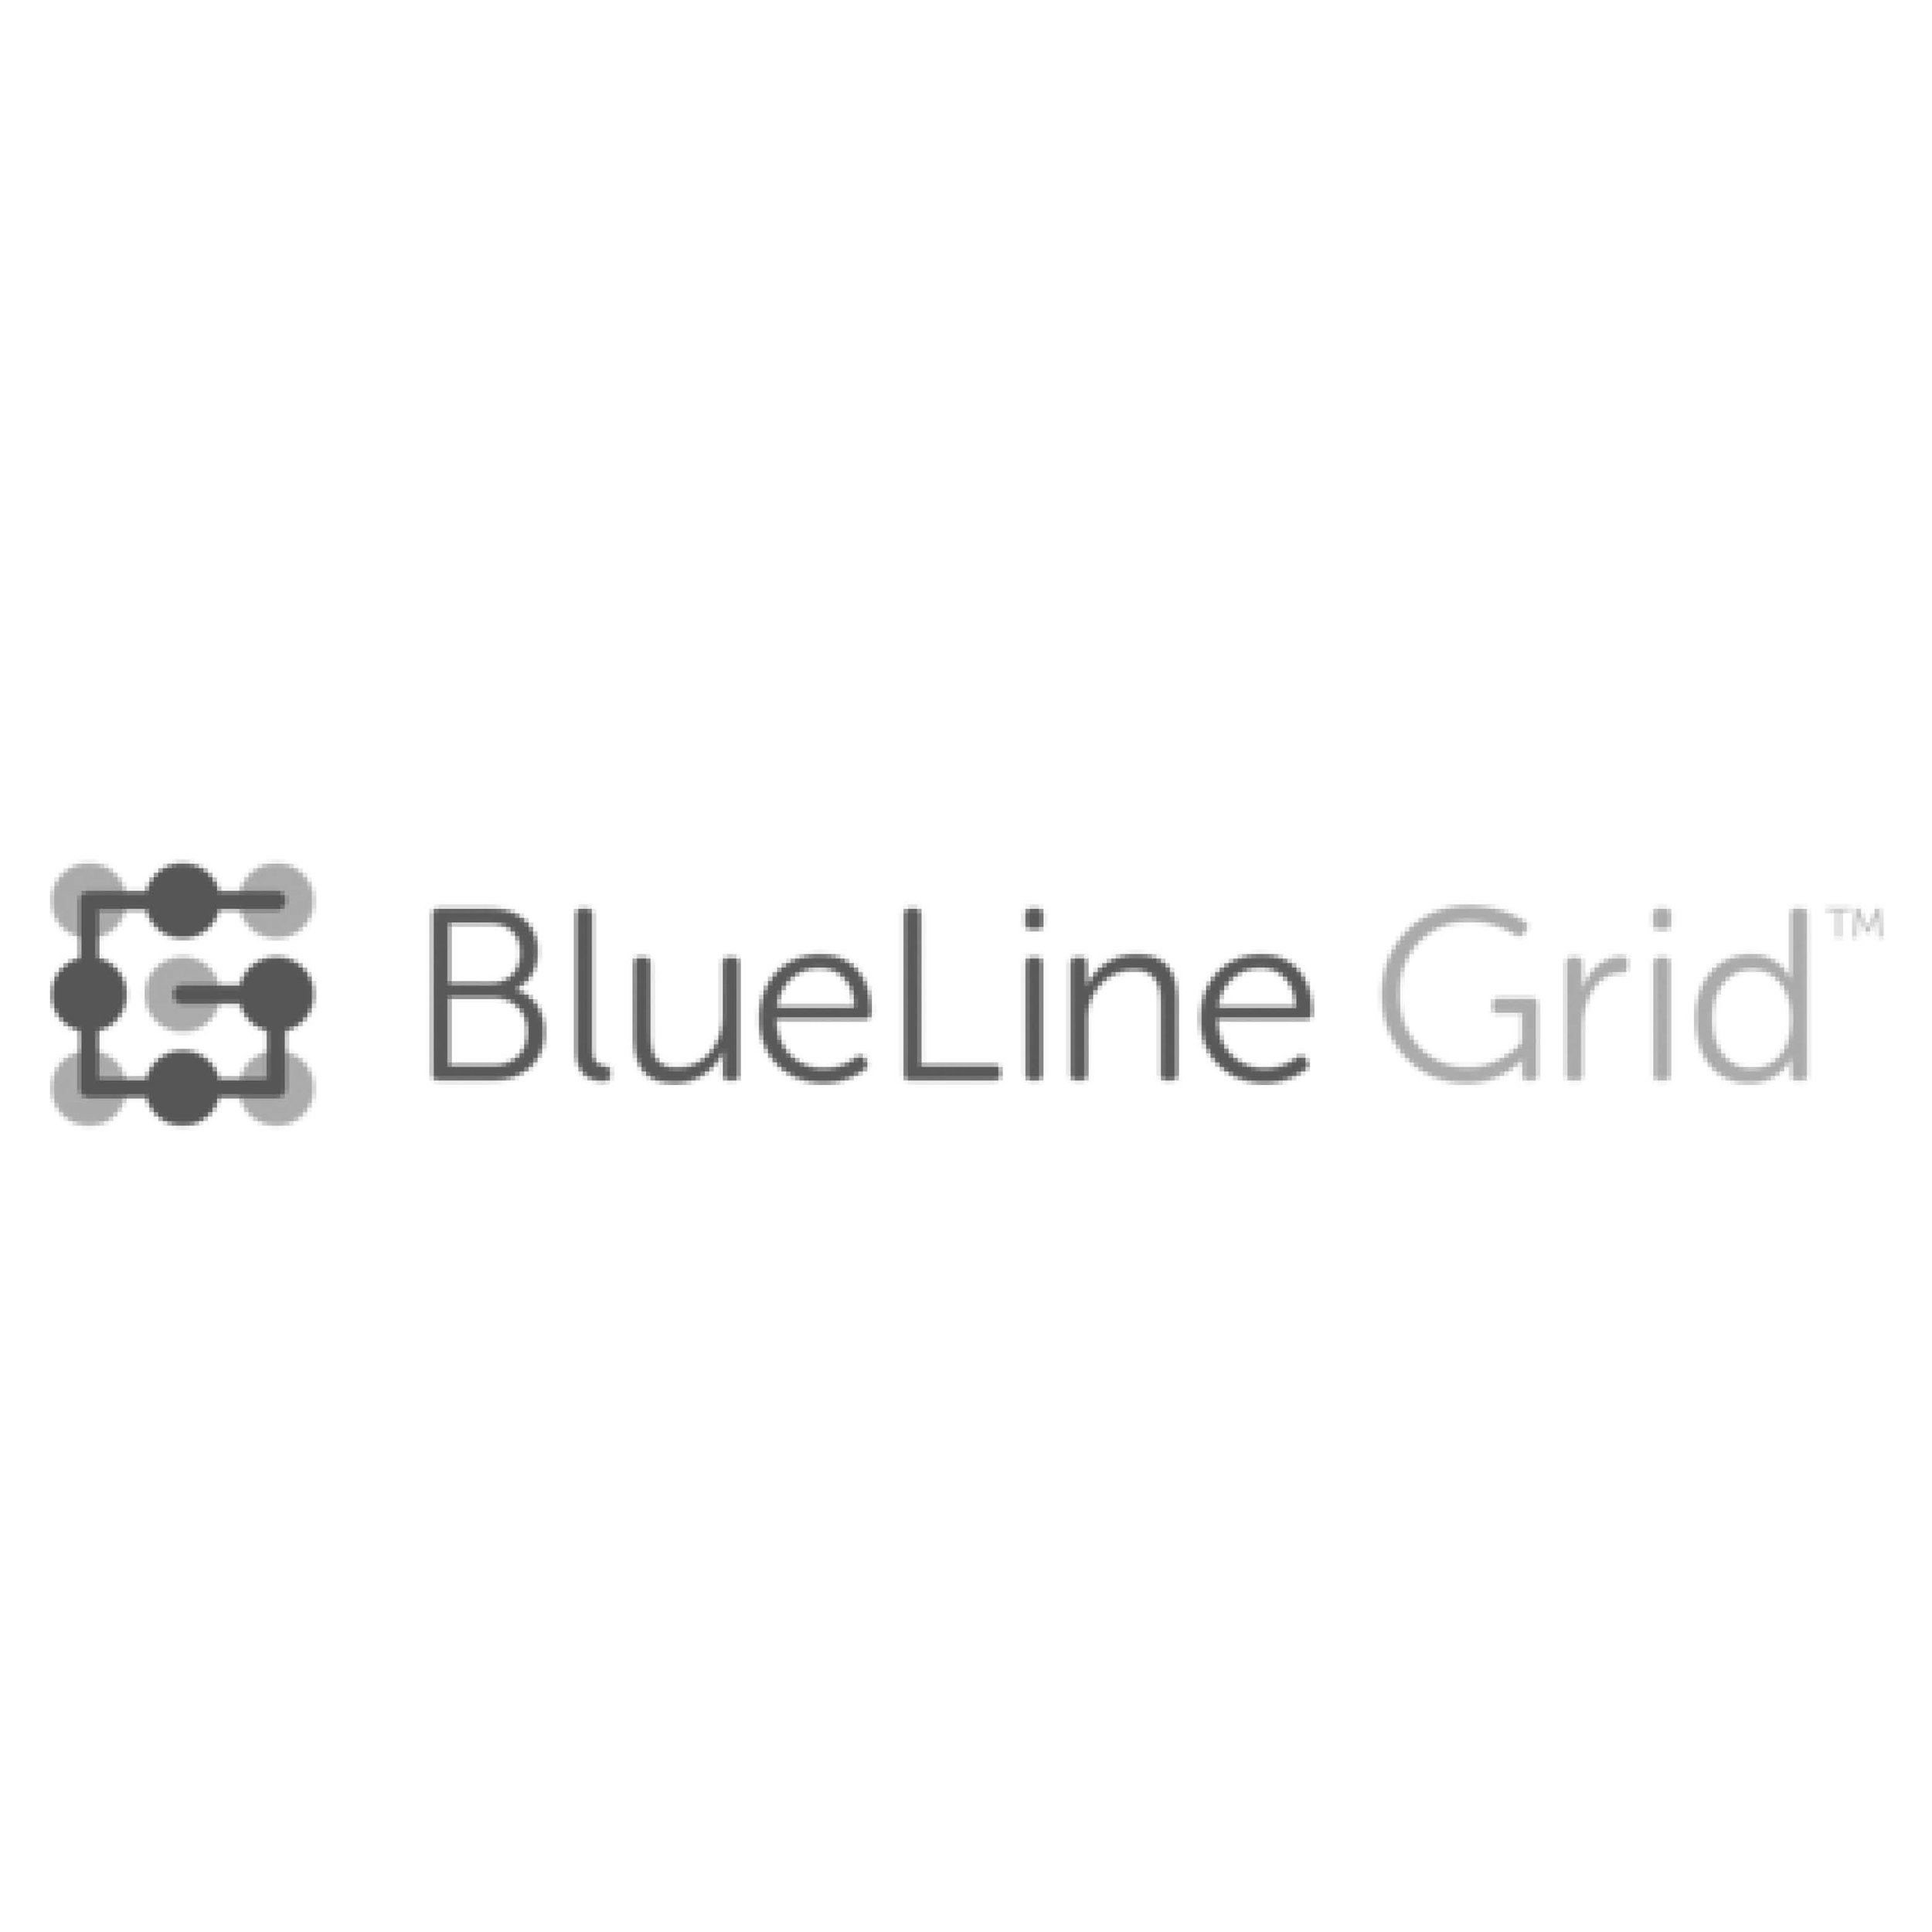 blueline.jpg